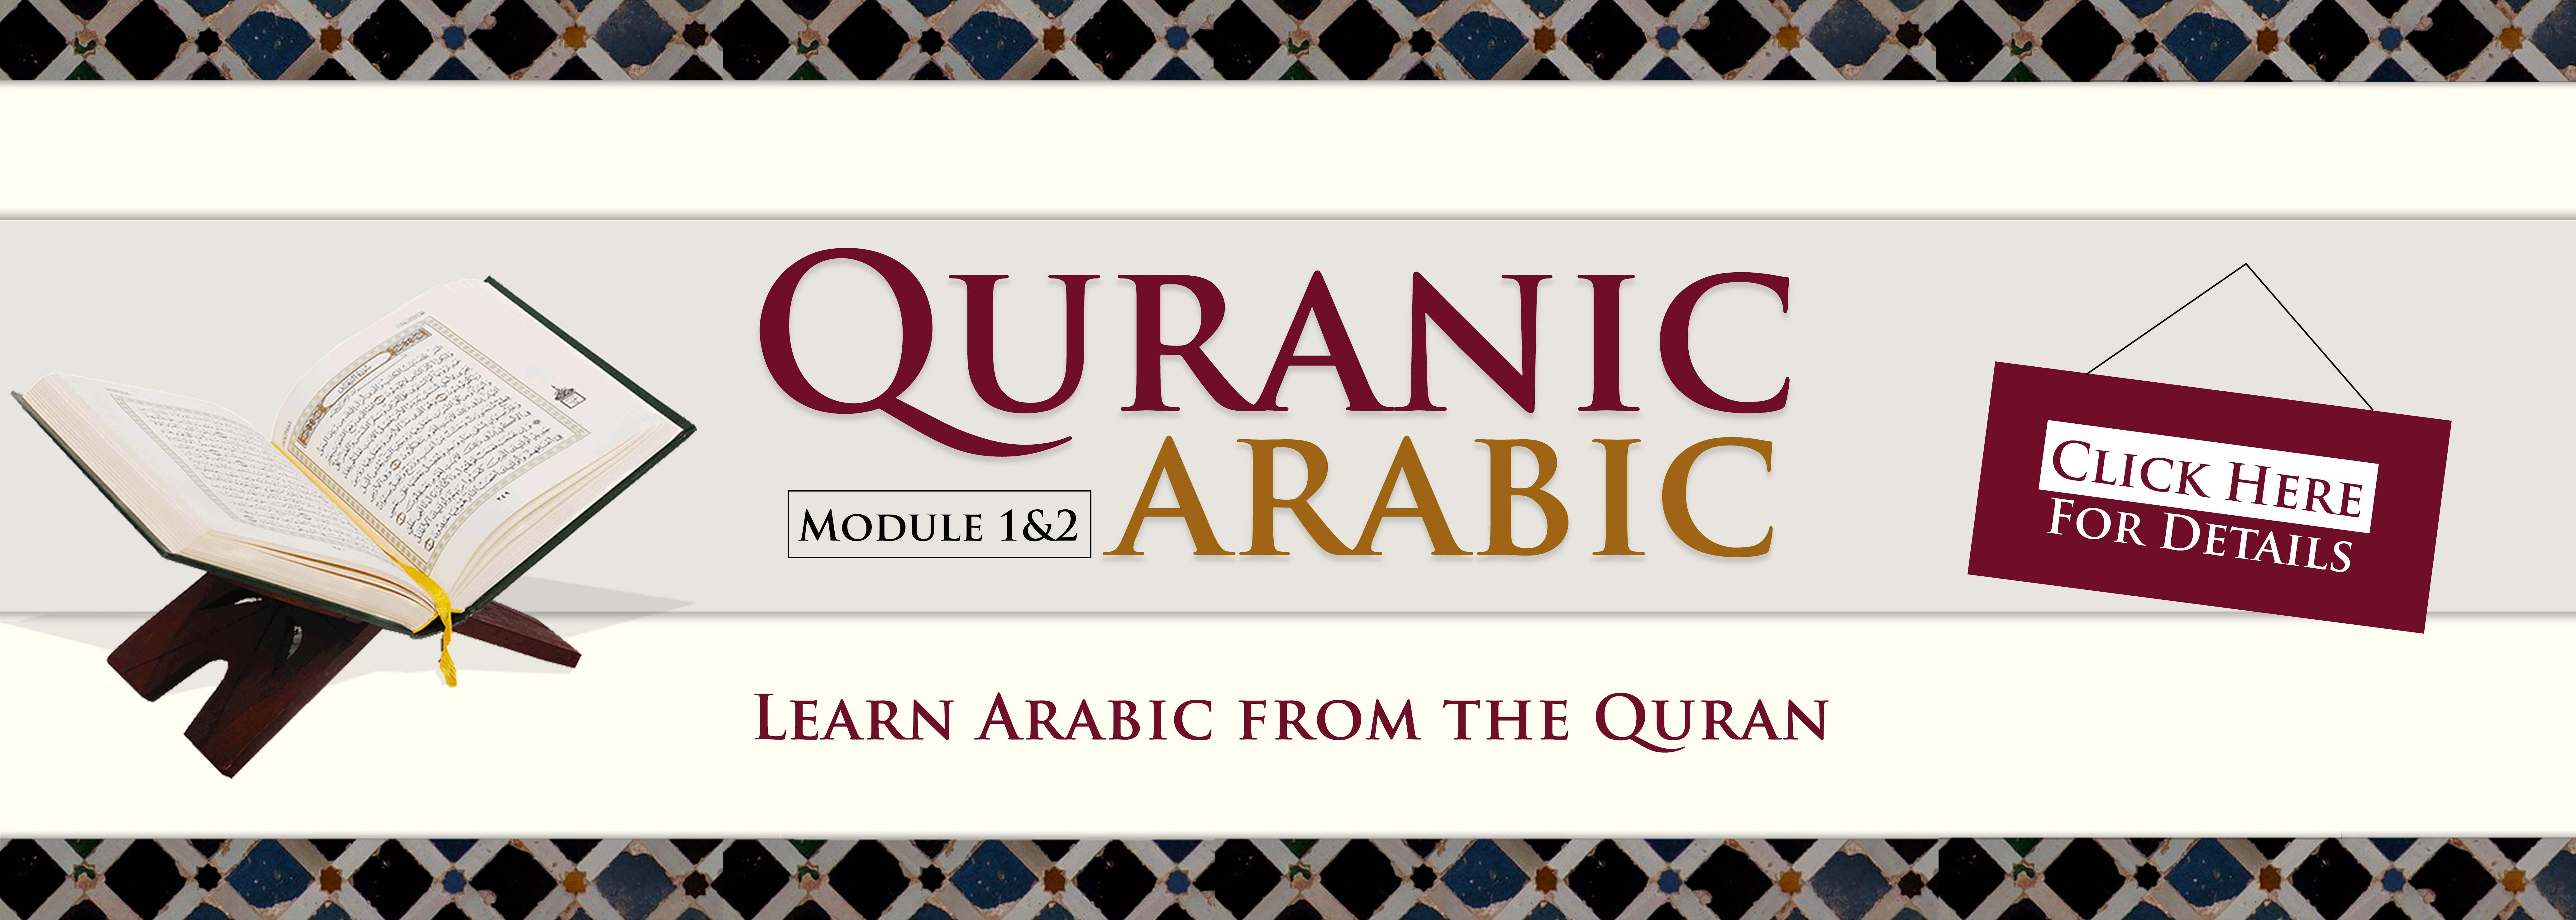 Quranic Arabic (Module 1 & 2)